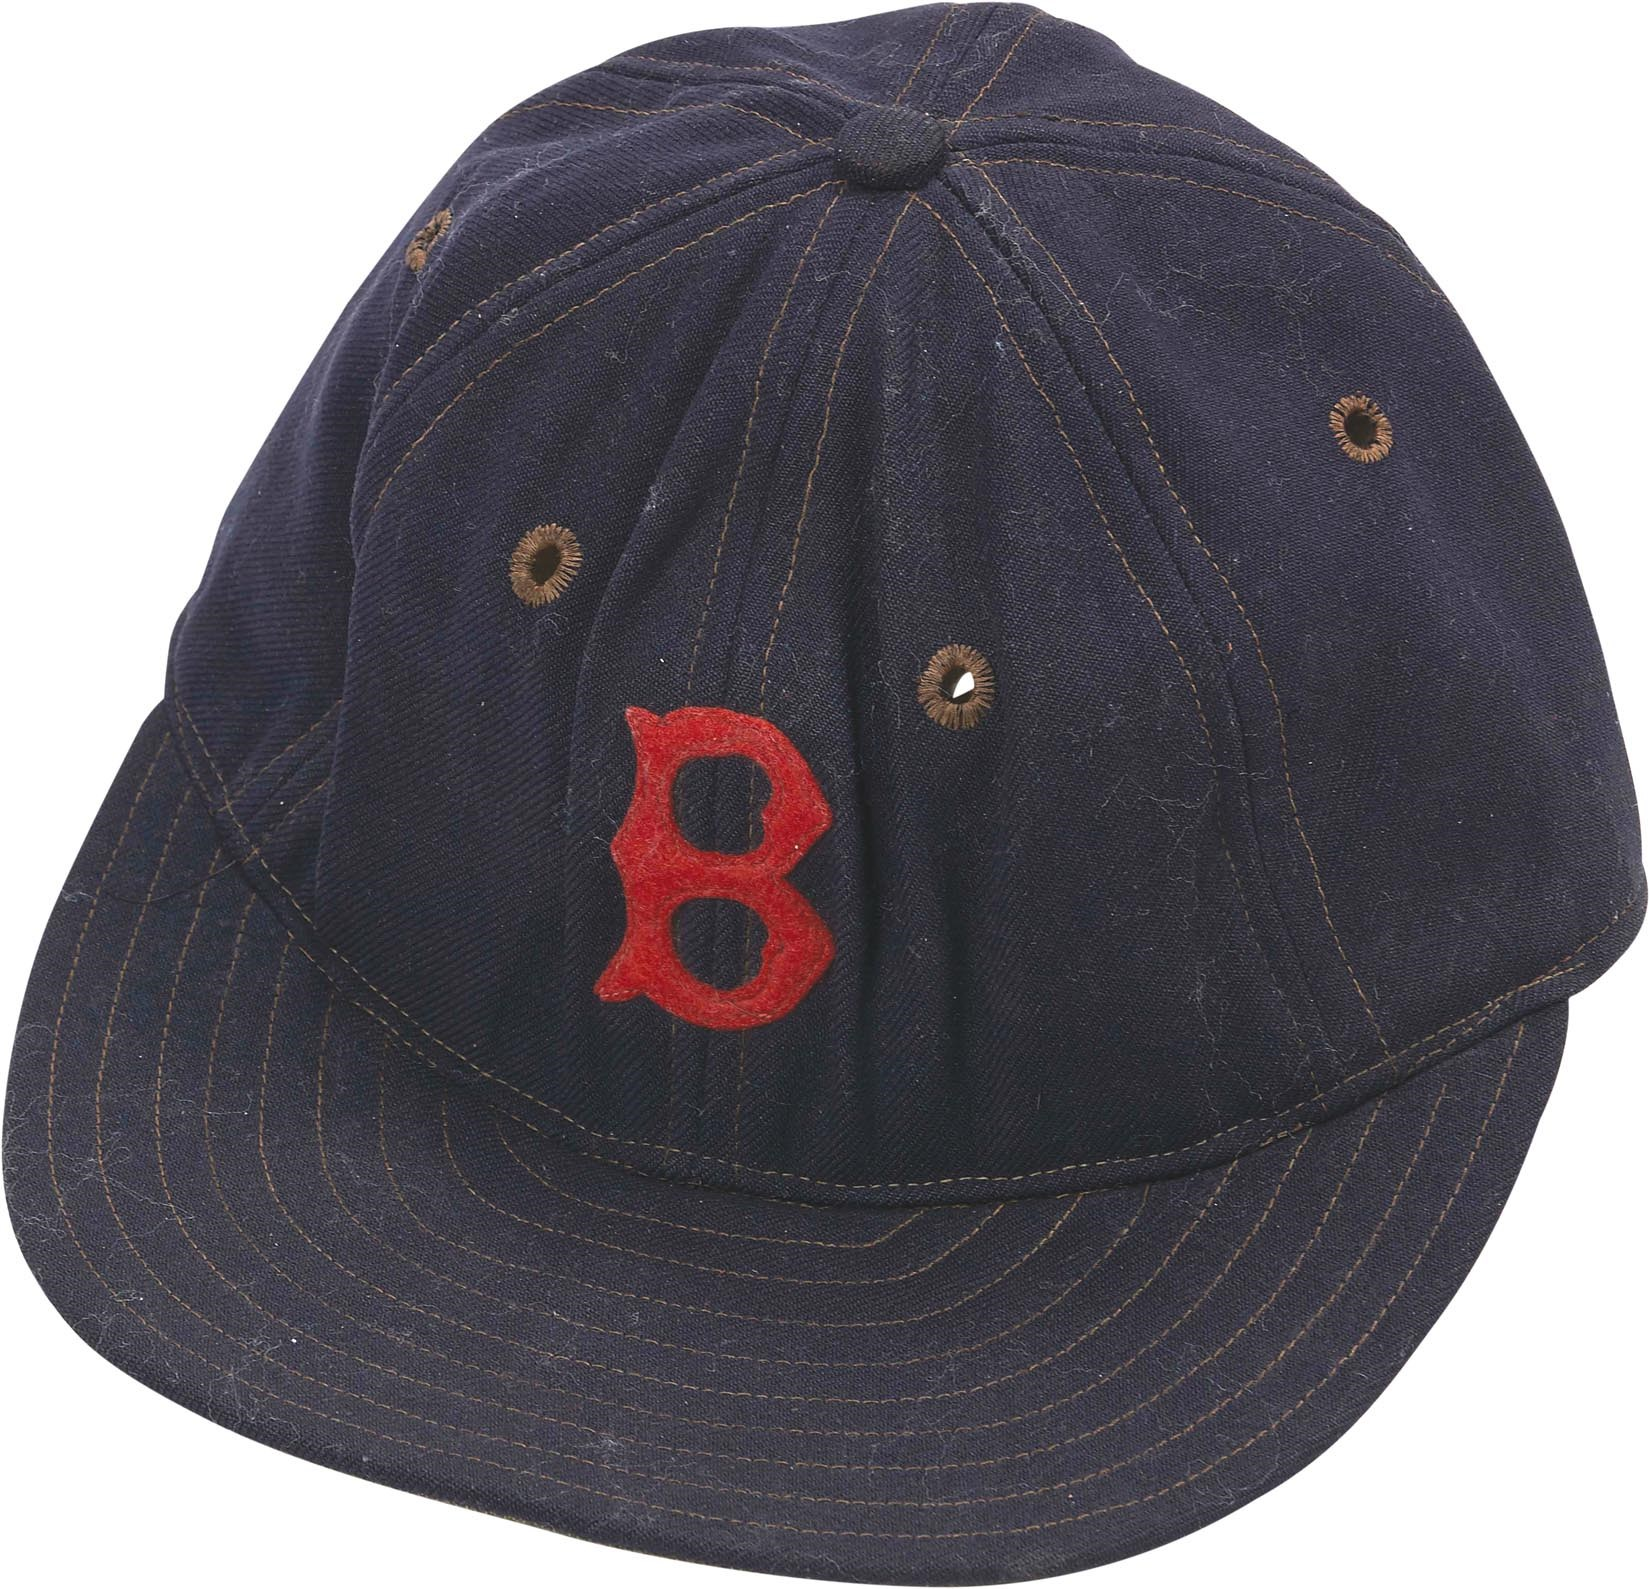 Boston Sports - 2018 Invitational